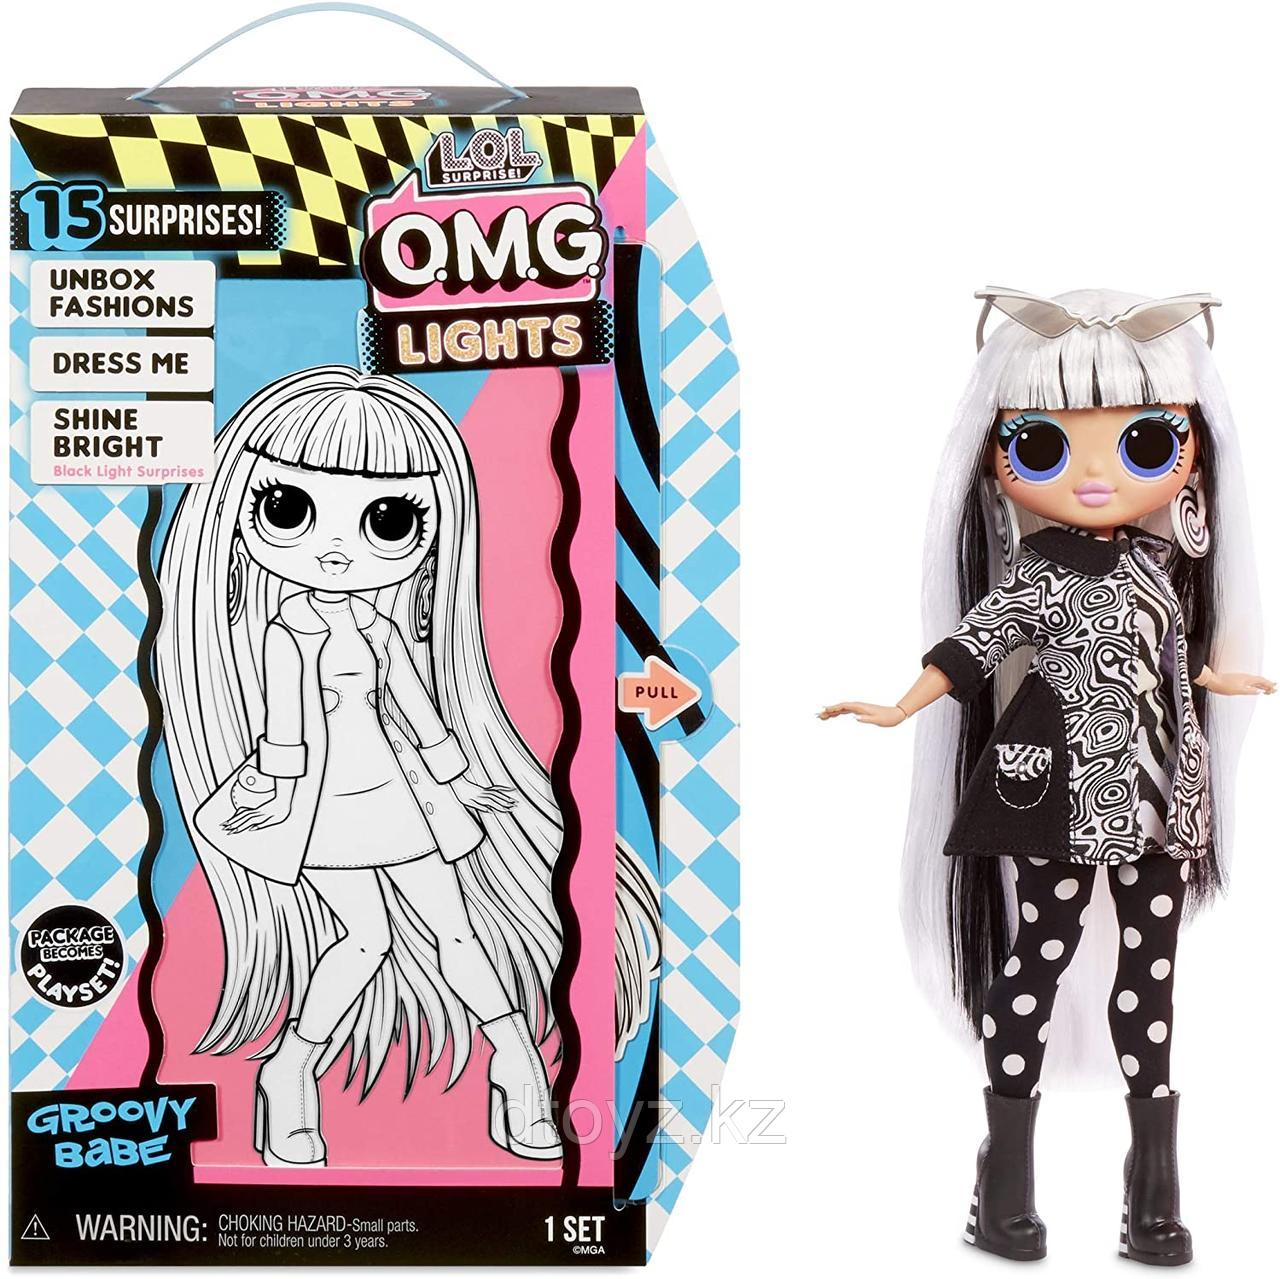 Модная Кукла OMG Lights Groovy Babe